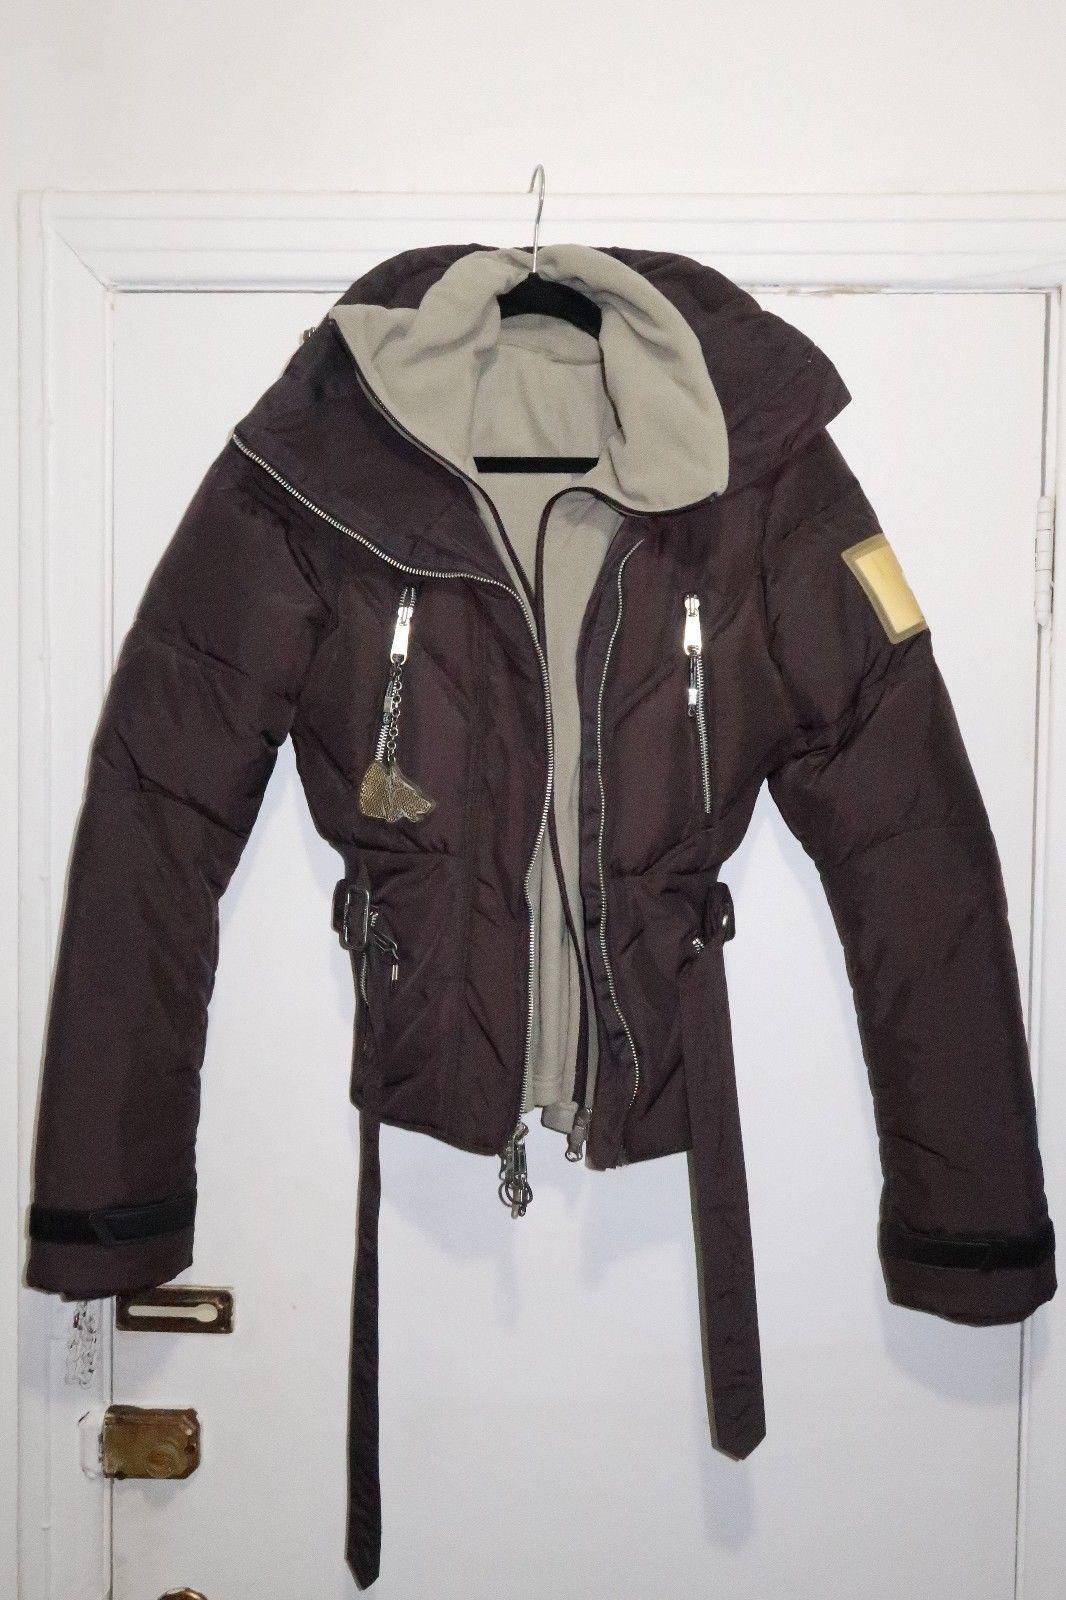 9770553319b1 Details about Woman s ADIDAS Stella McCartney Ski Jacket